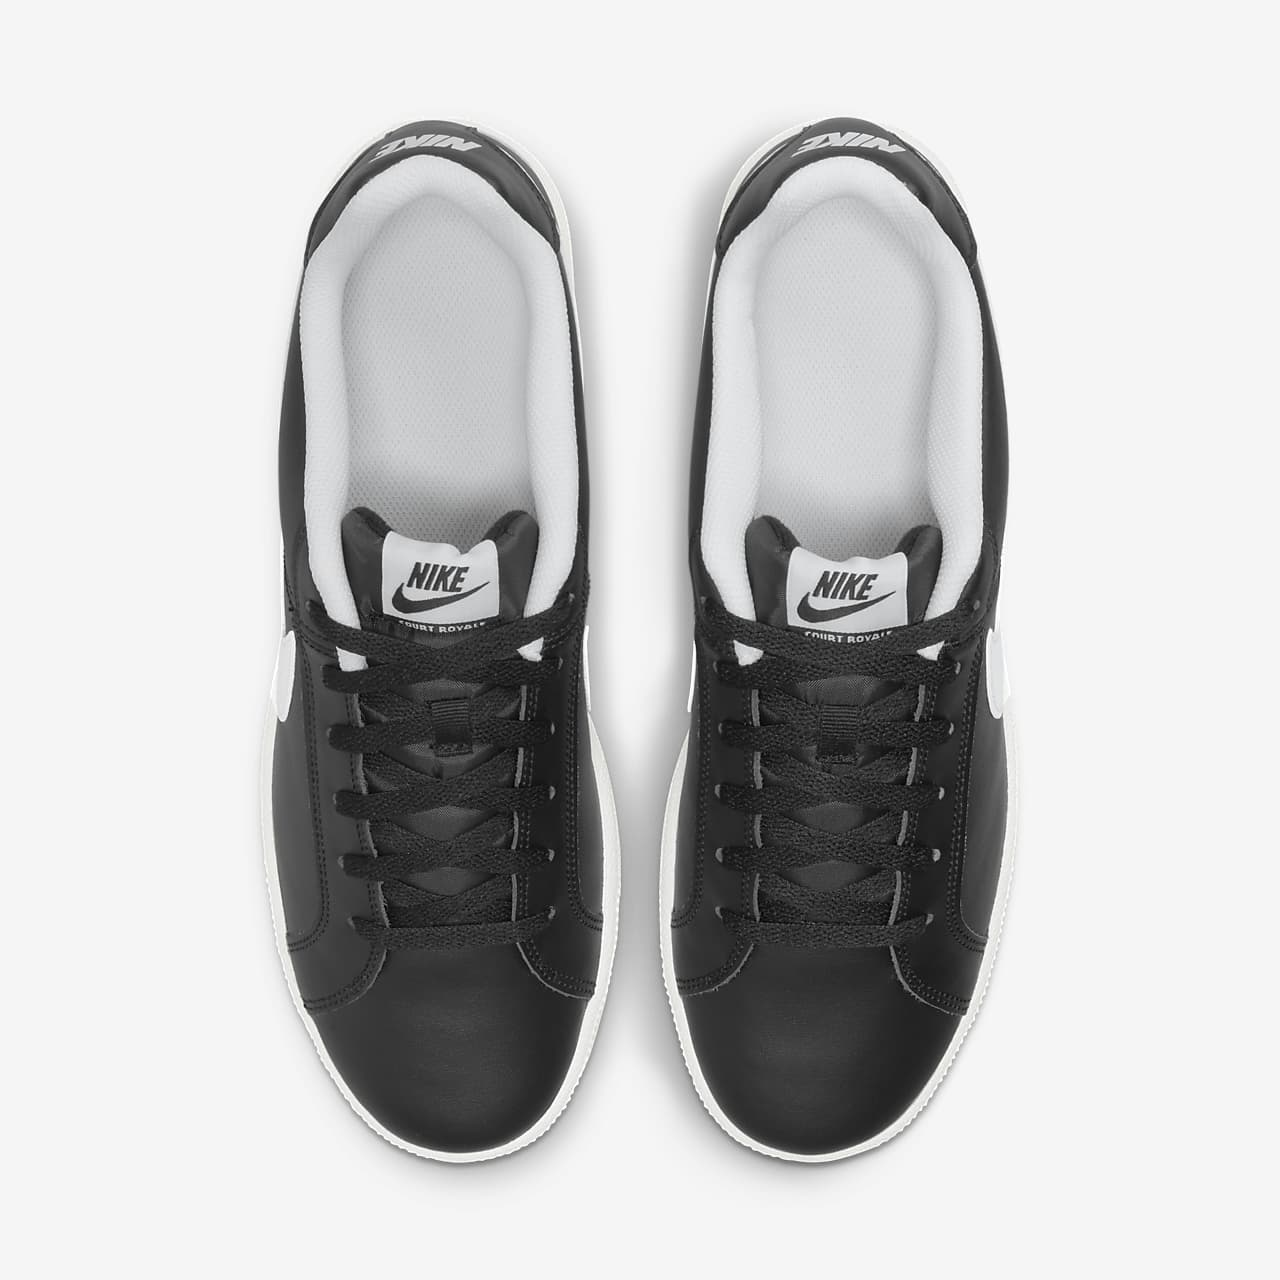 Low Resolution NikeCourt Royale Men s Shoe NikeCourt Royale Men s Shoe 2170fc980